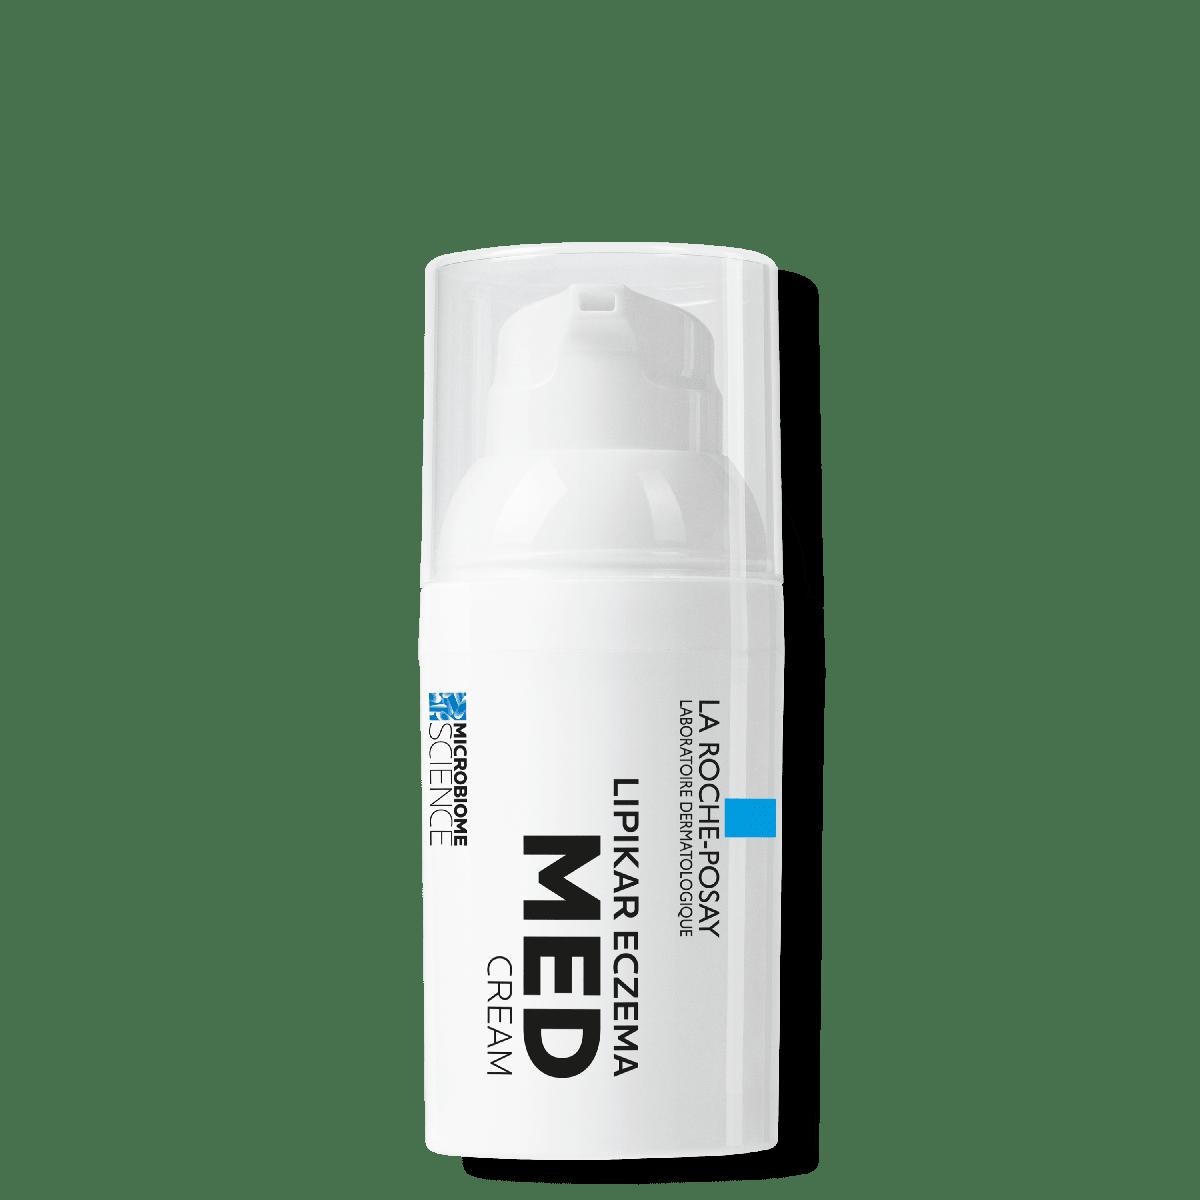 La-Roche-Posay-Lipikar-Eczema-Med-Cream-packshot-front